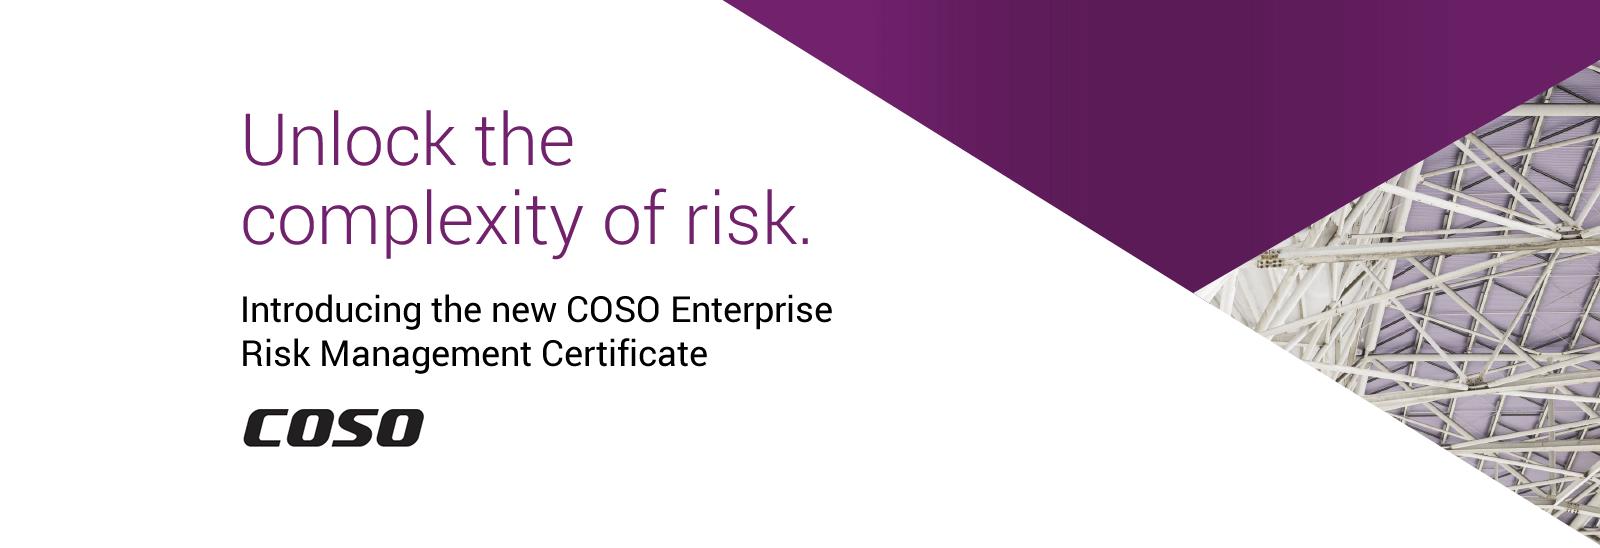 Coso Enterprise Risk Management Certificate Program Aicpa Certificates